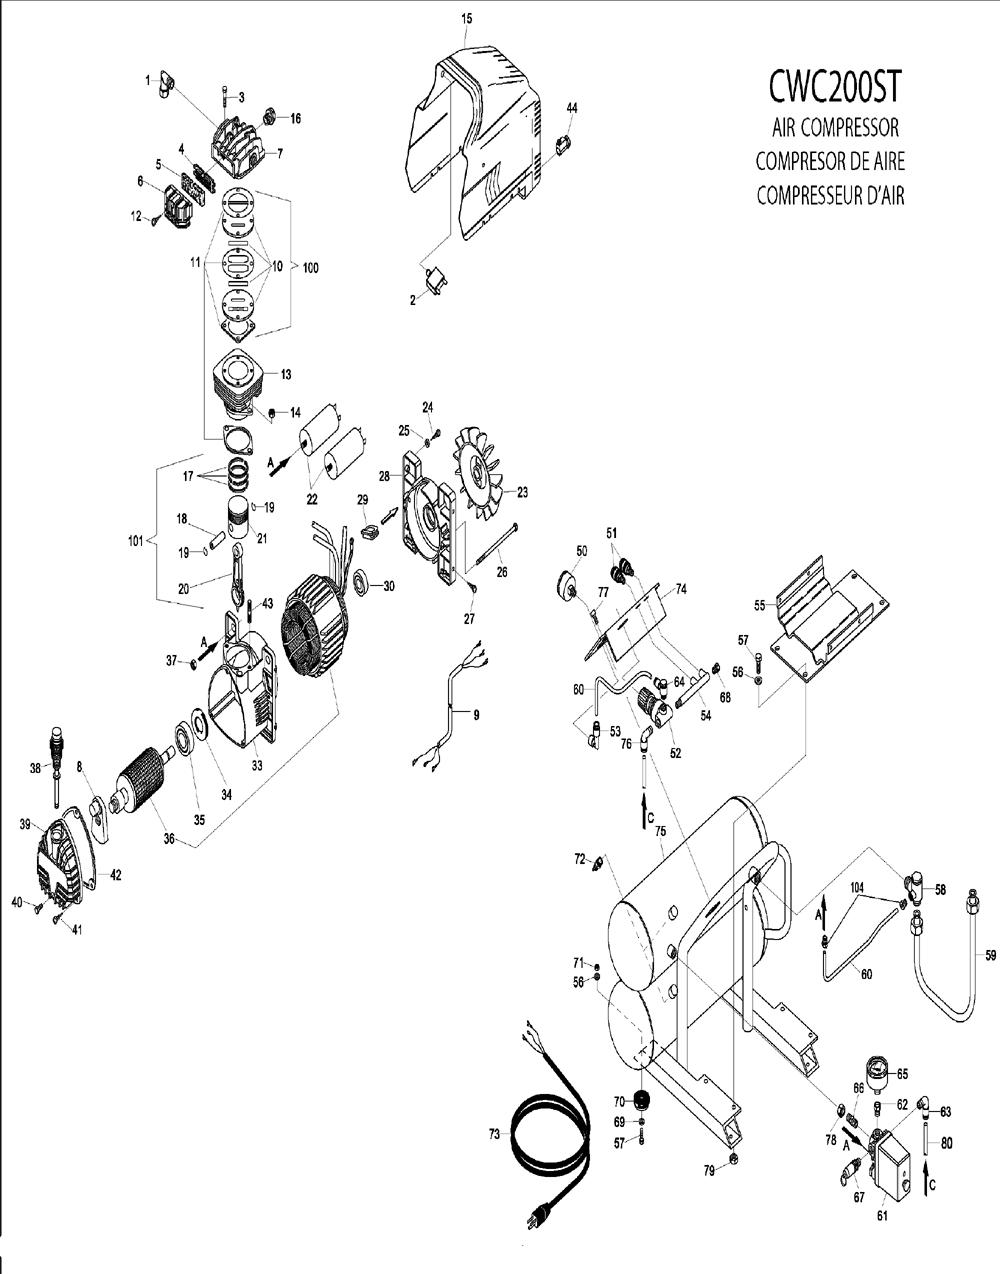 Bostitch Cwc200st Parts List